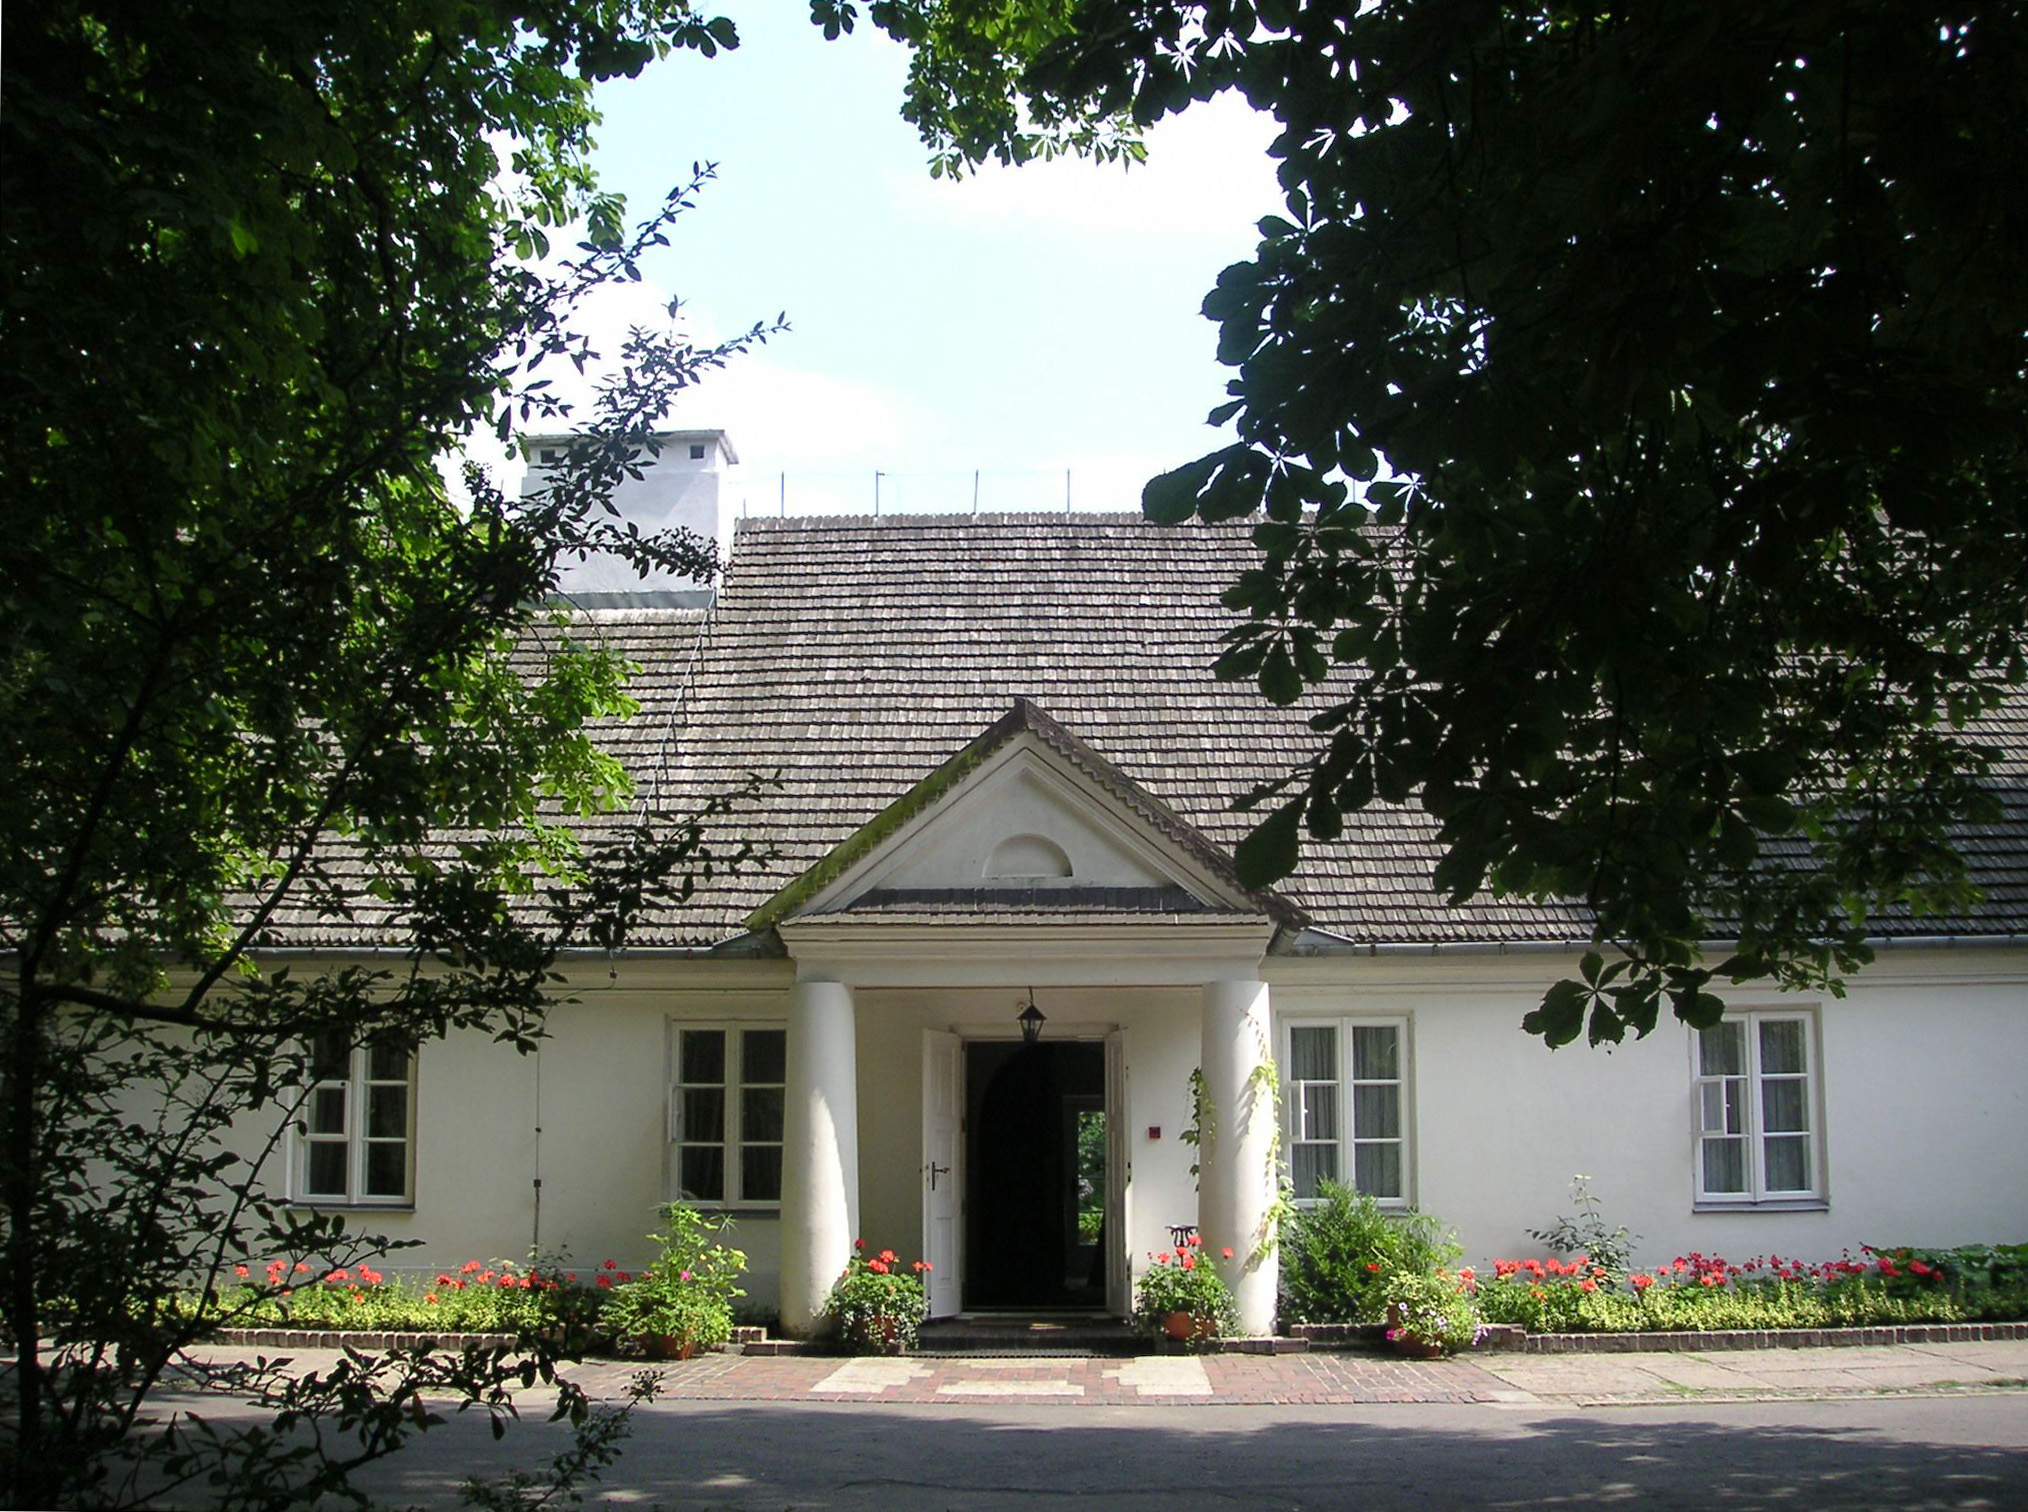 Casa natal de Chopin en Żelazowa Wola